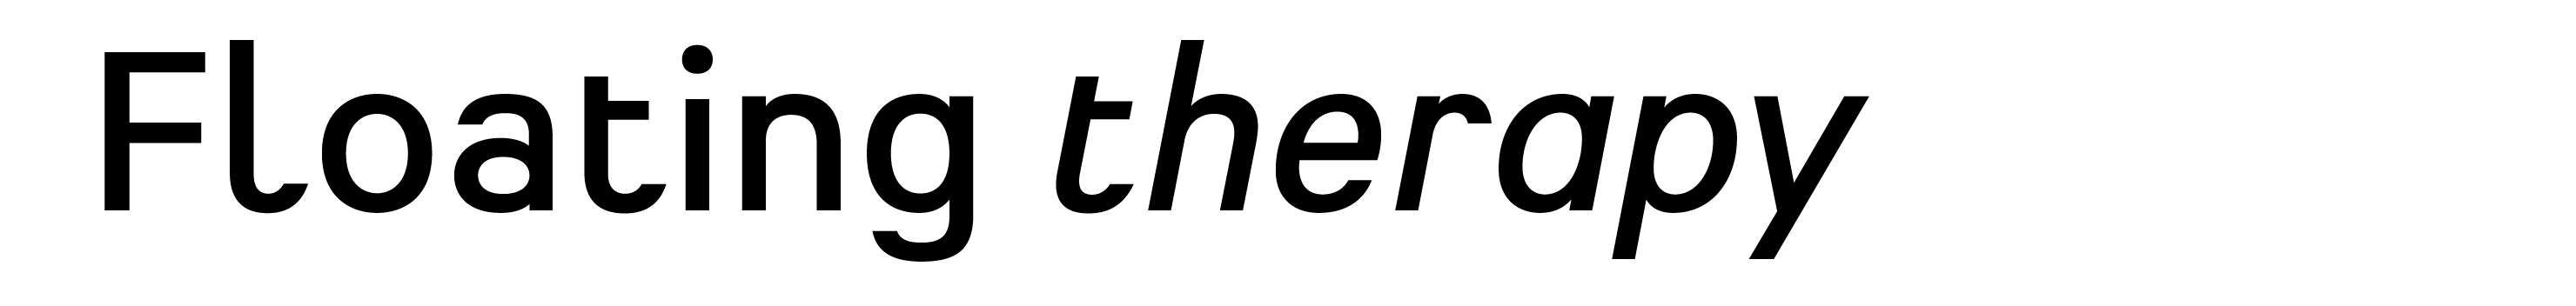 Typeface Heimat Sans D10 Atlas Font Foundry